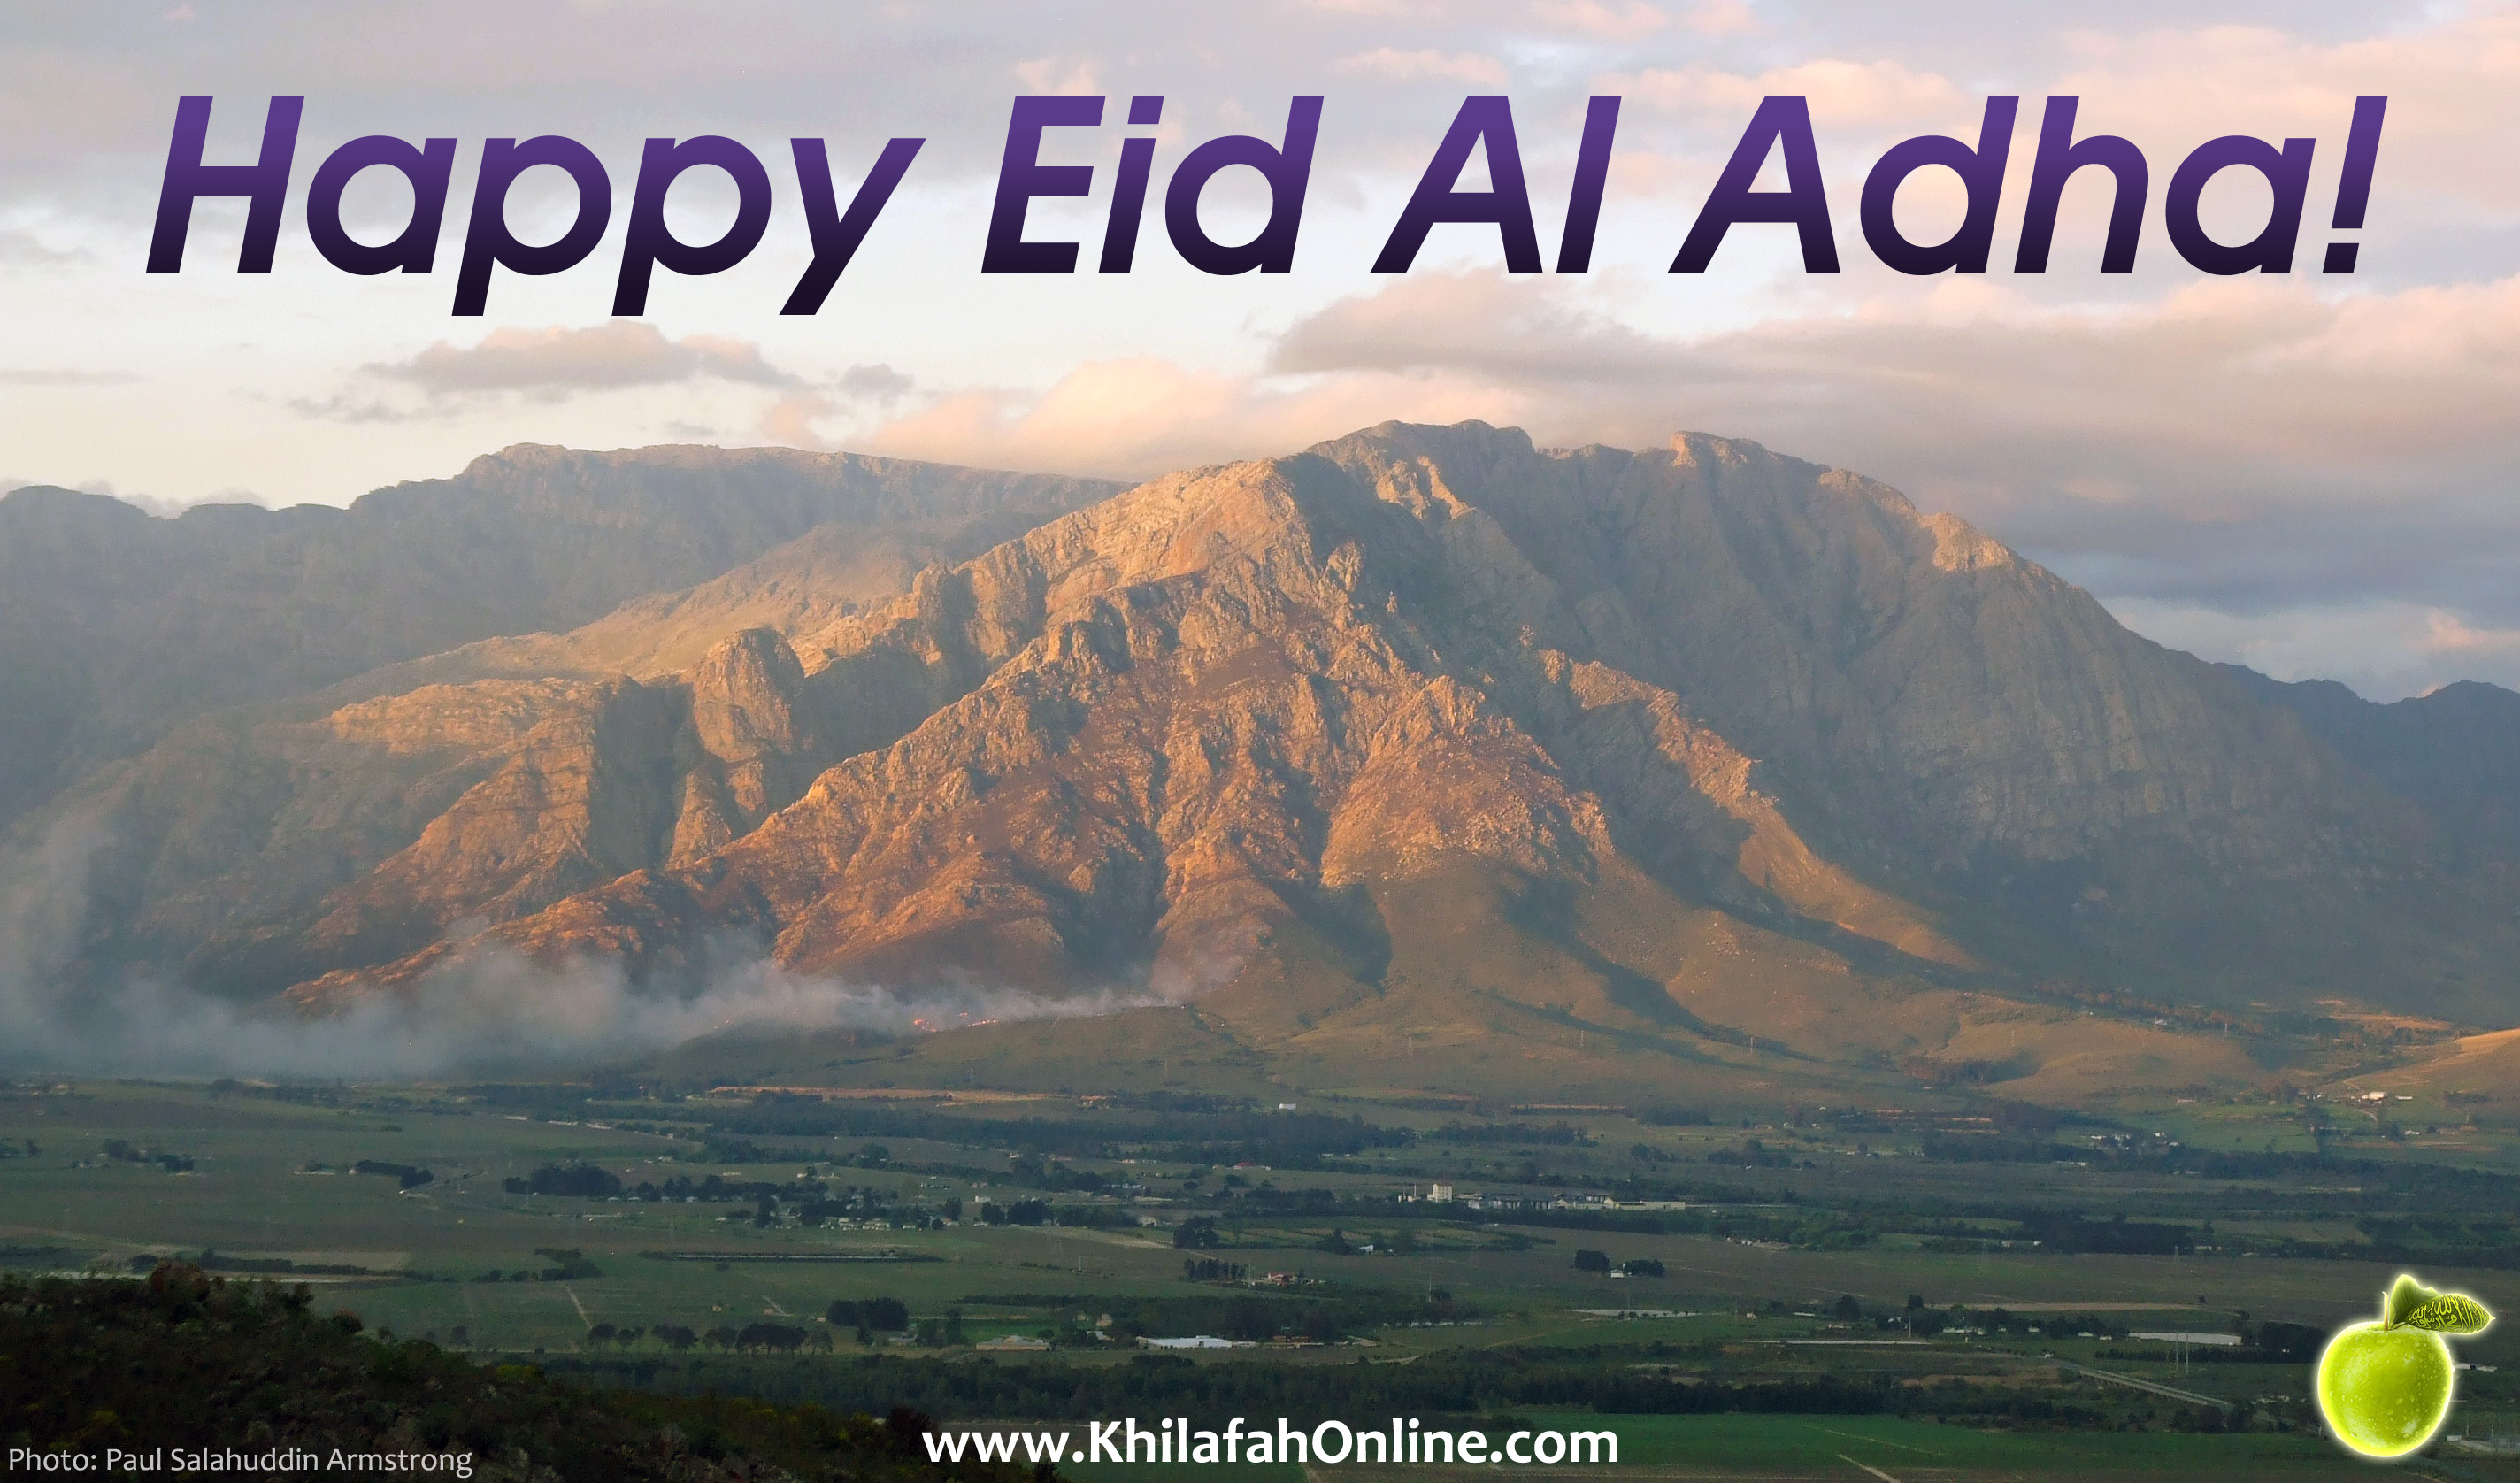 Happy Eid Al Adha! (1436 / 2015)